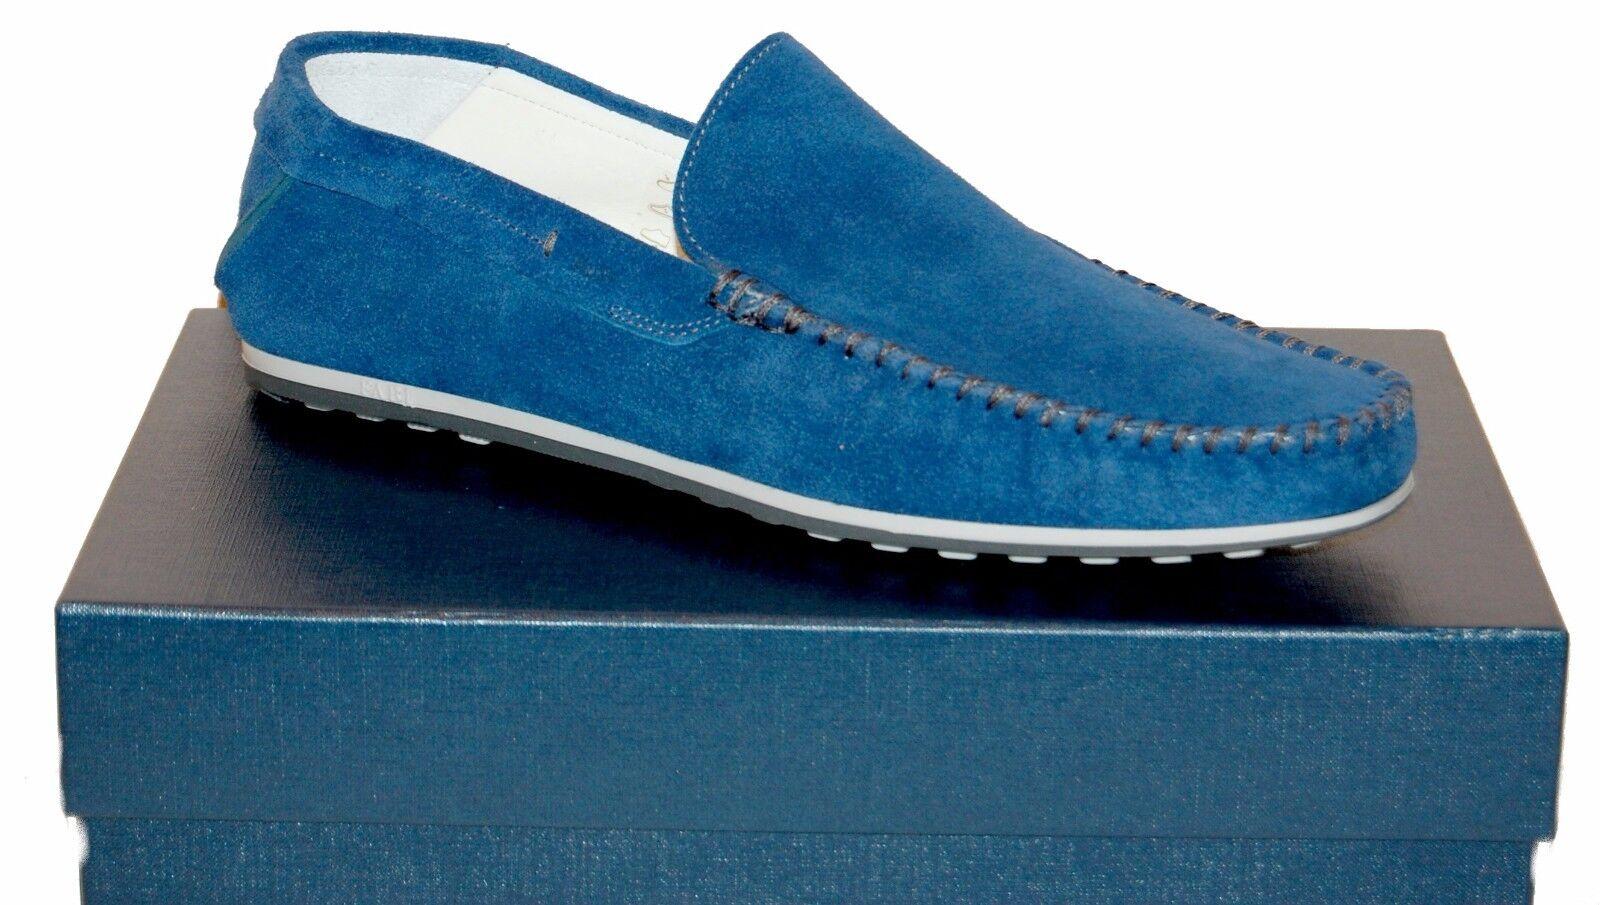 Fabi Men bluee Suede Loafer  Driving  shoes Moccasins Sz US 12 EU 45